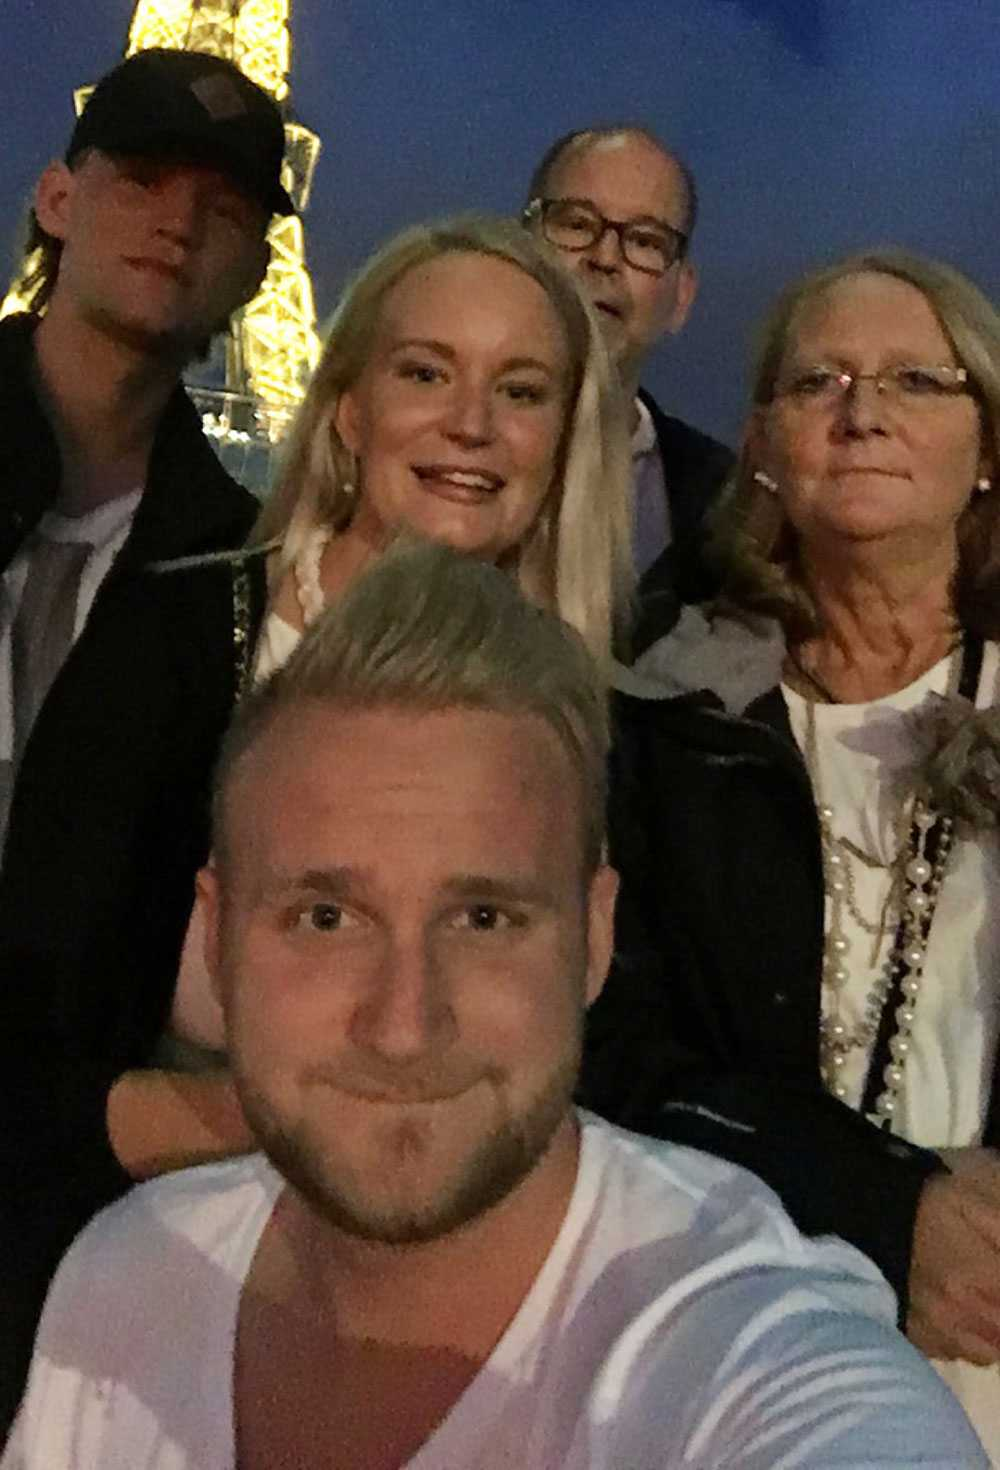 Jonathan Öberg, 18, Mats Öberg, 55, Birgitta Öberg, Mats ex-fru 50, Ida Öberg, 25, och Rasmus Öberg, son 21.